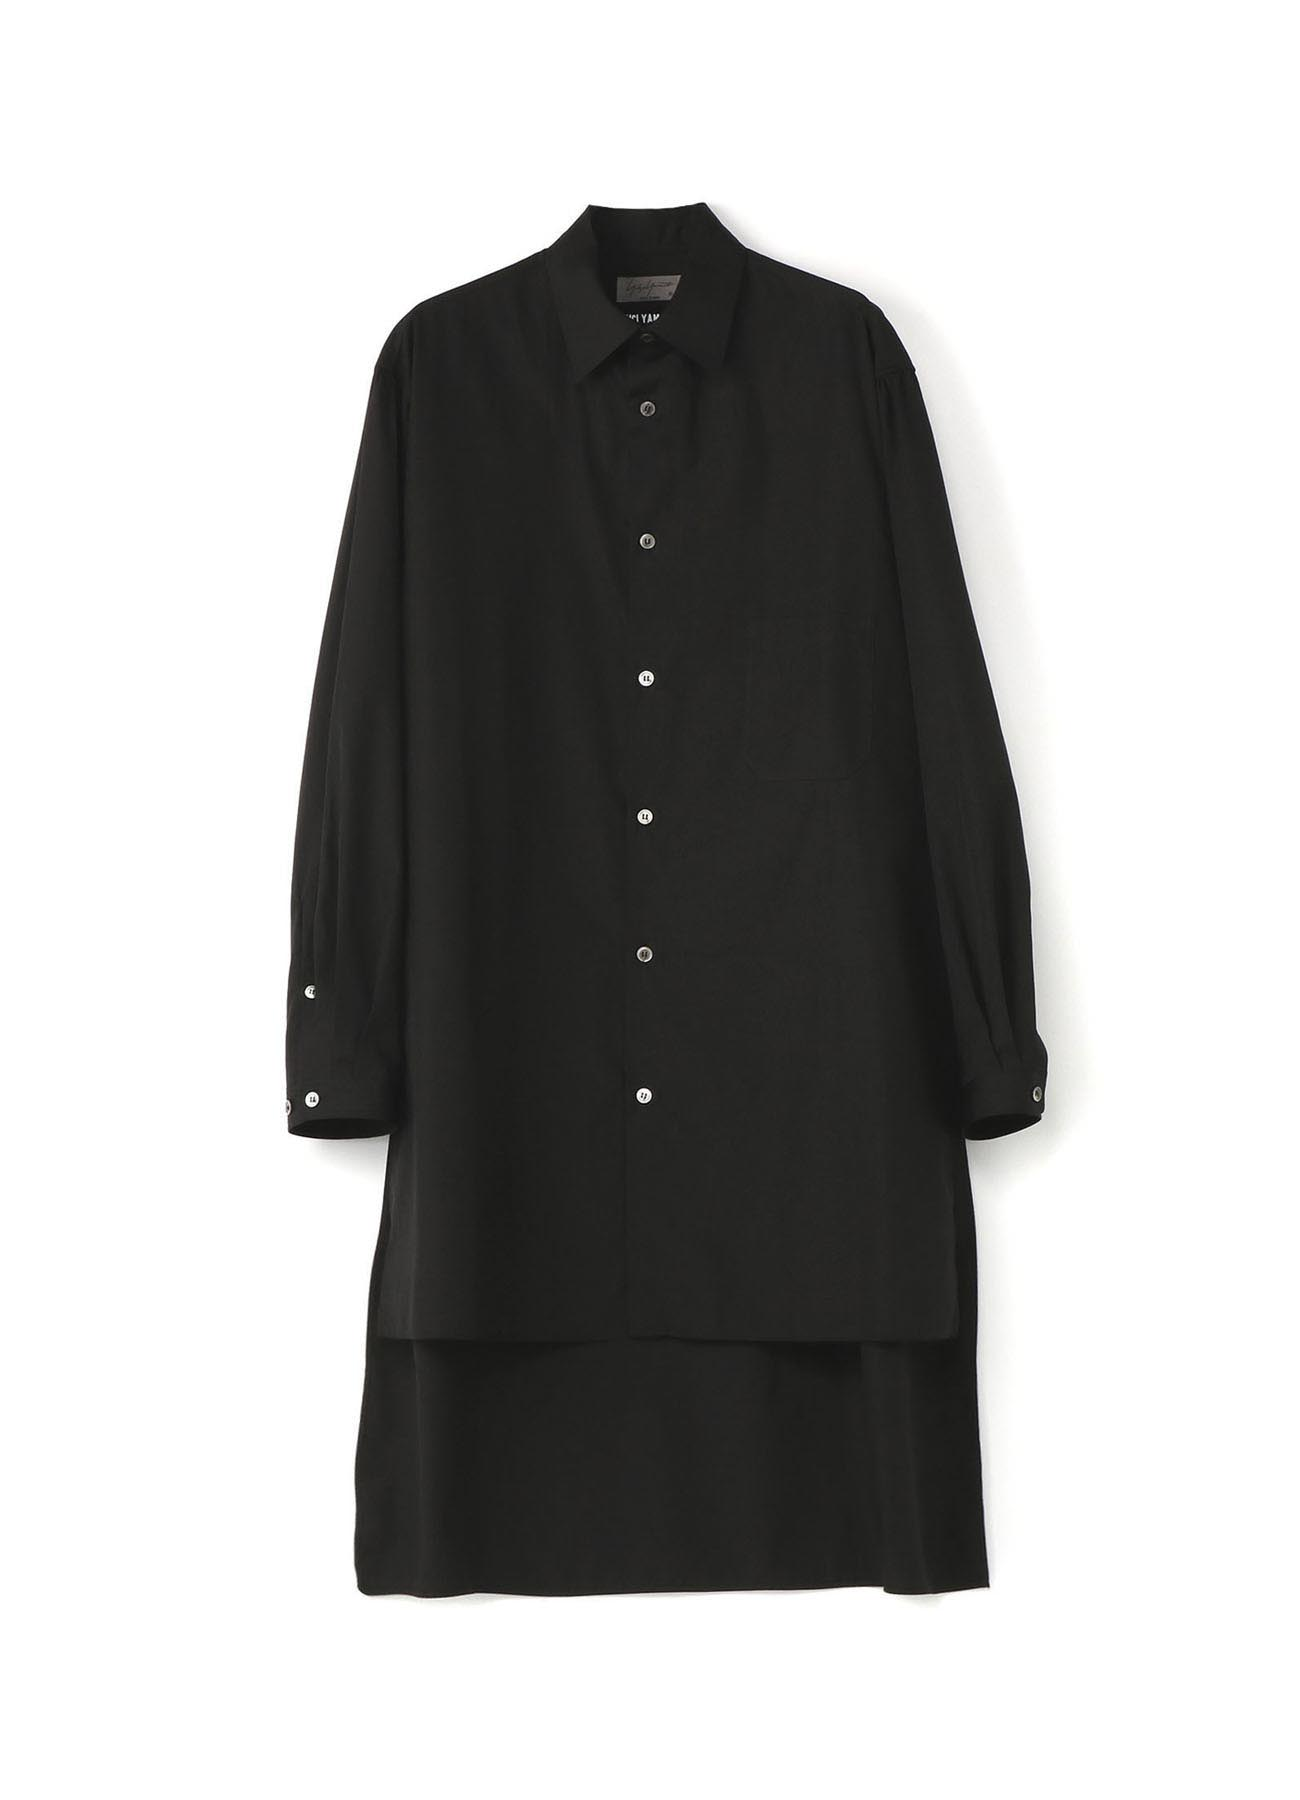 【THE SHOP限定】ブロードロングシャツ